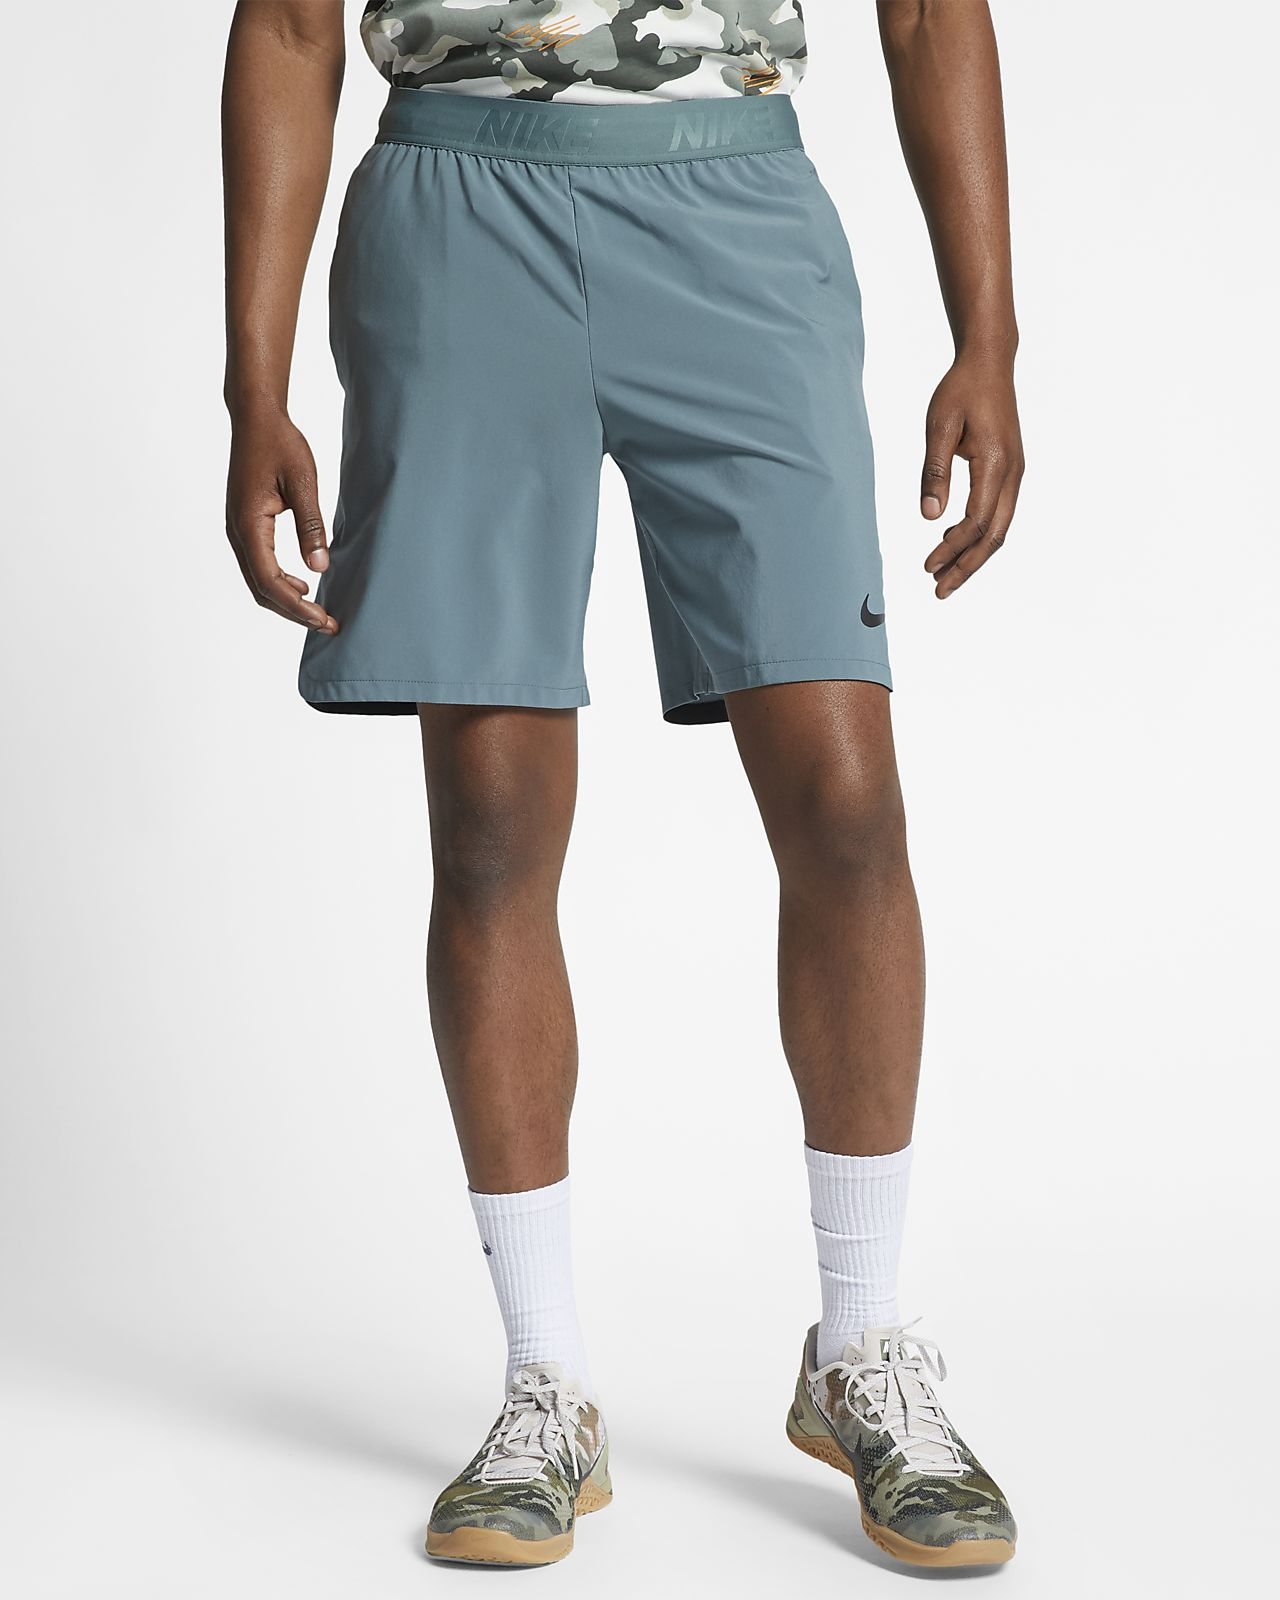 b8f697f2cb1e3 Nike Flex Men s 21cm Training Shorts. Nike.com LU